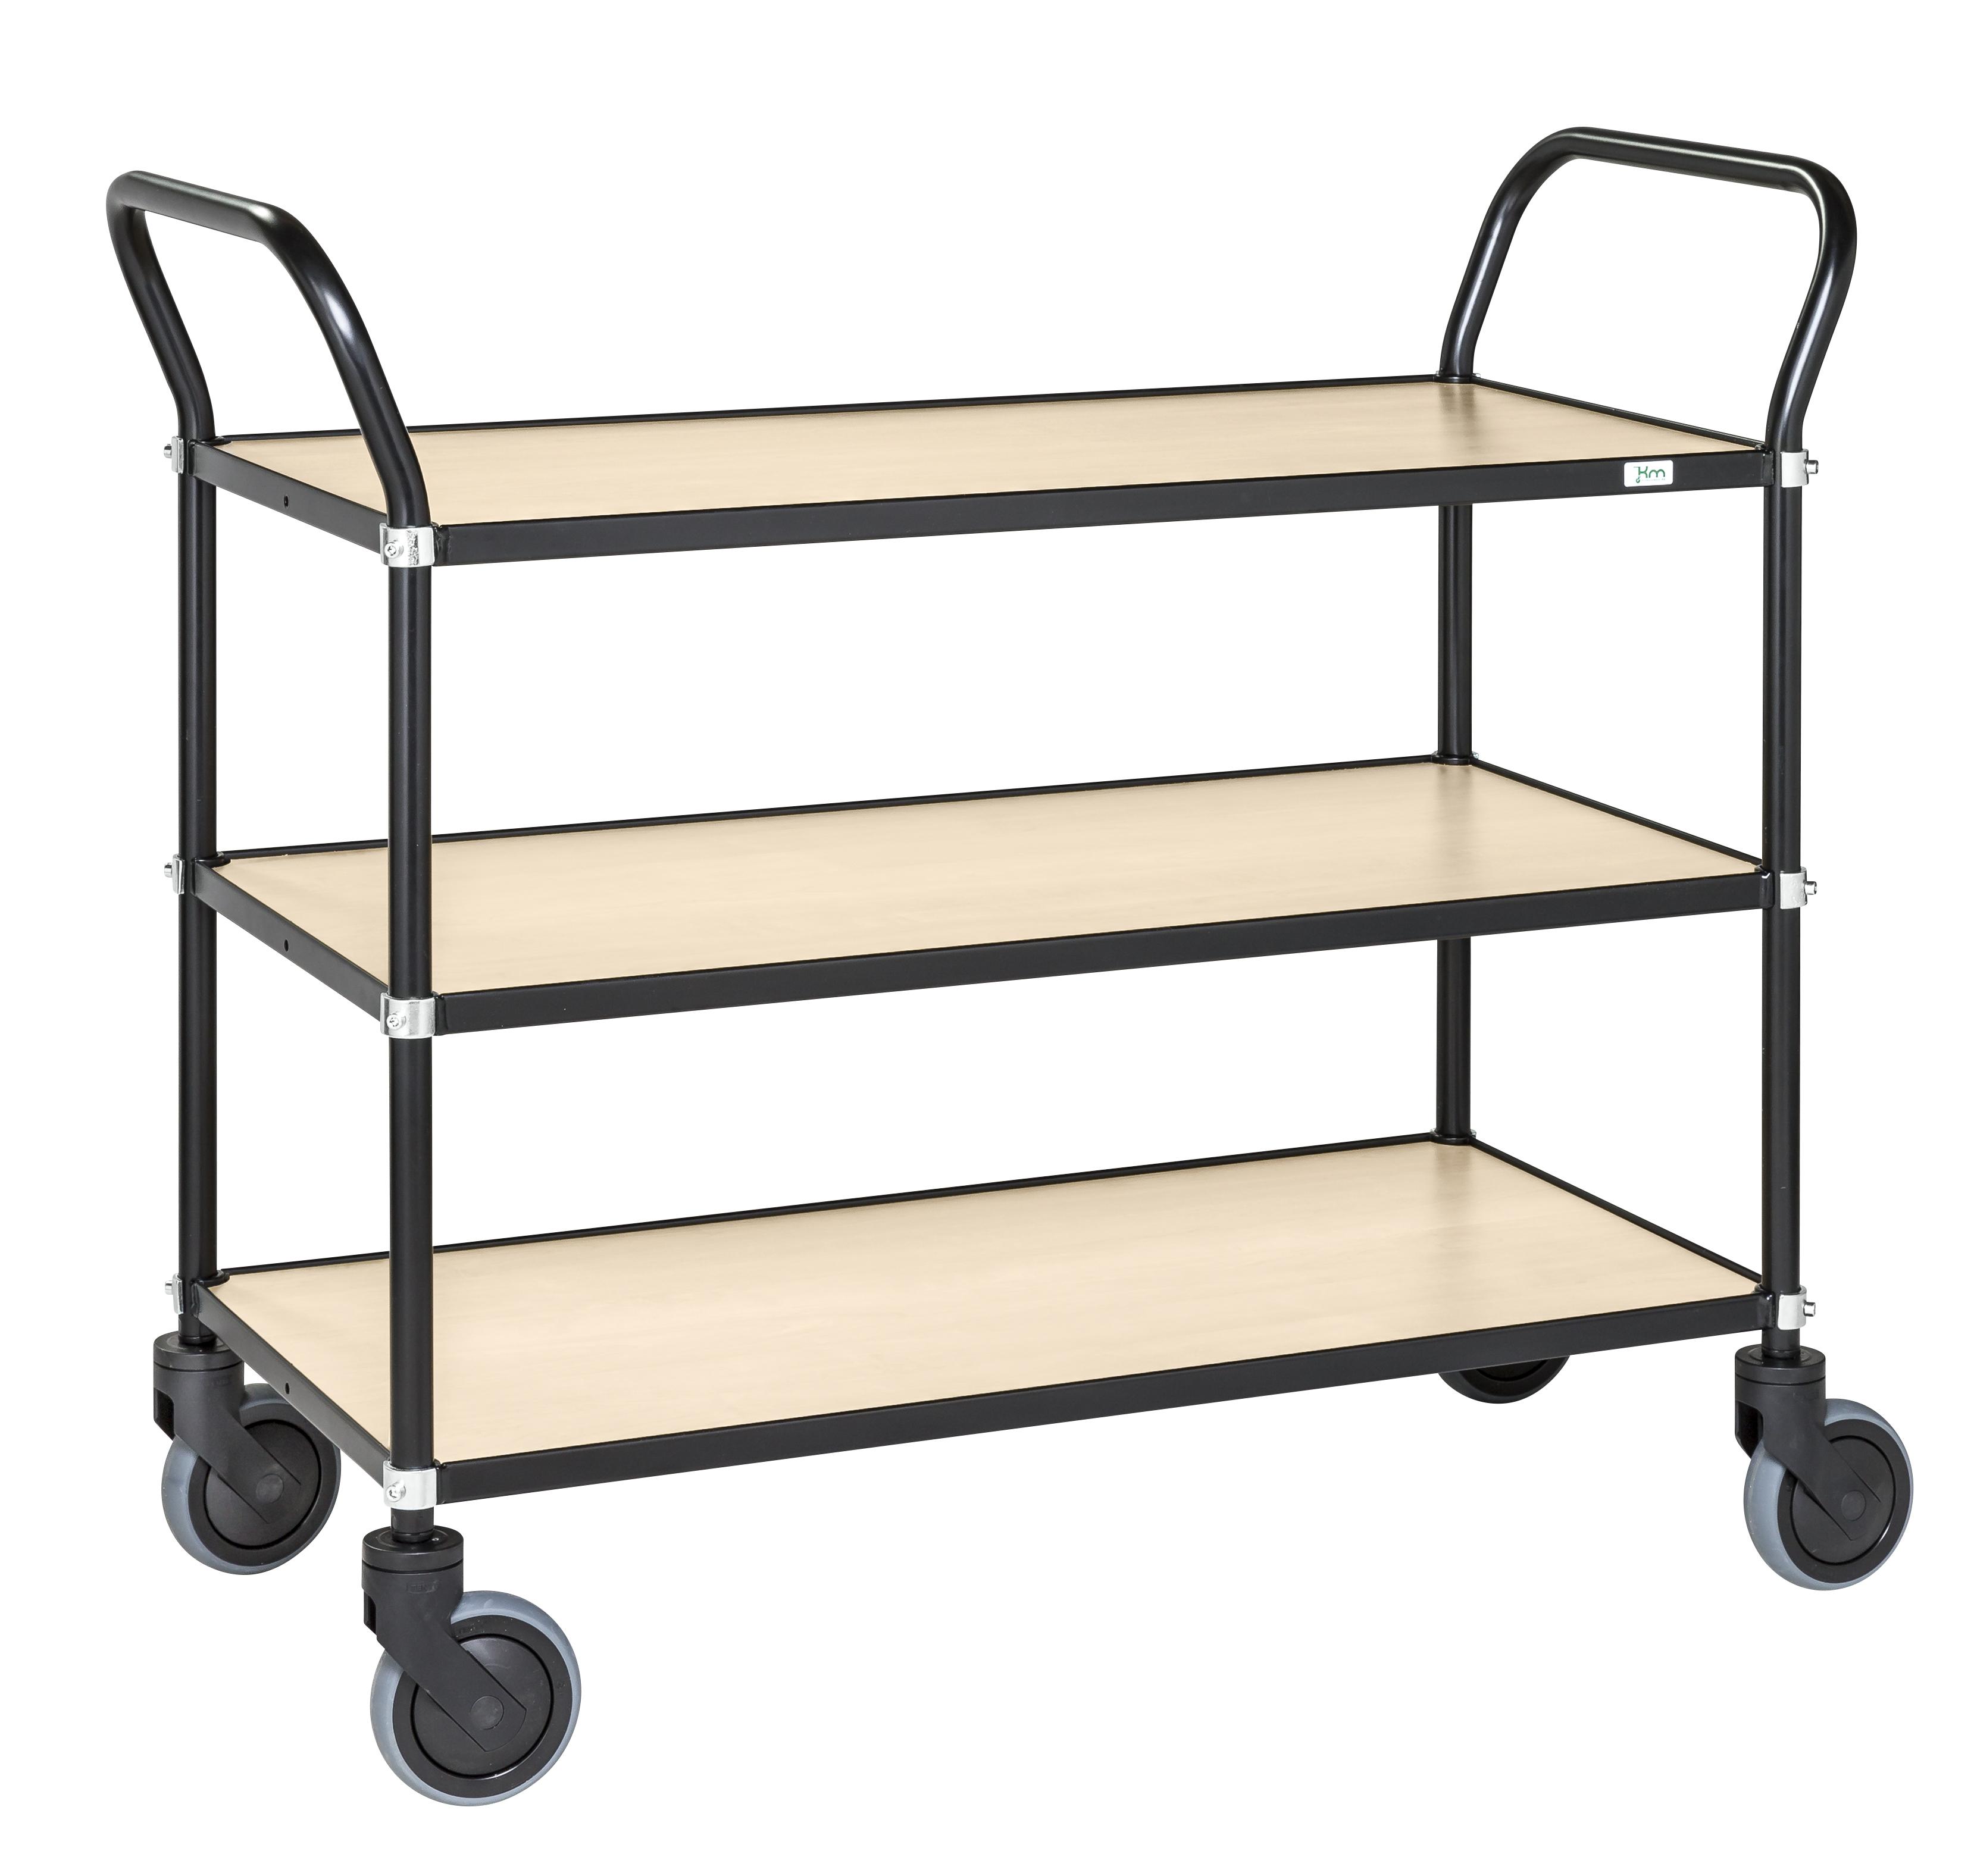 Design trolley KM8113-BJ